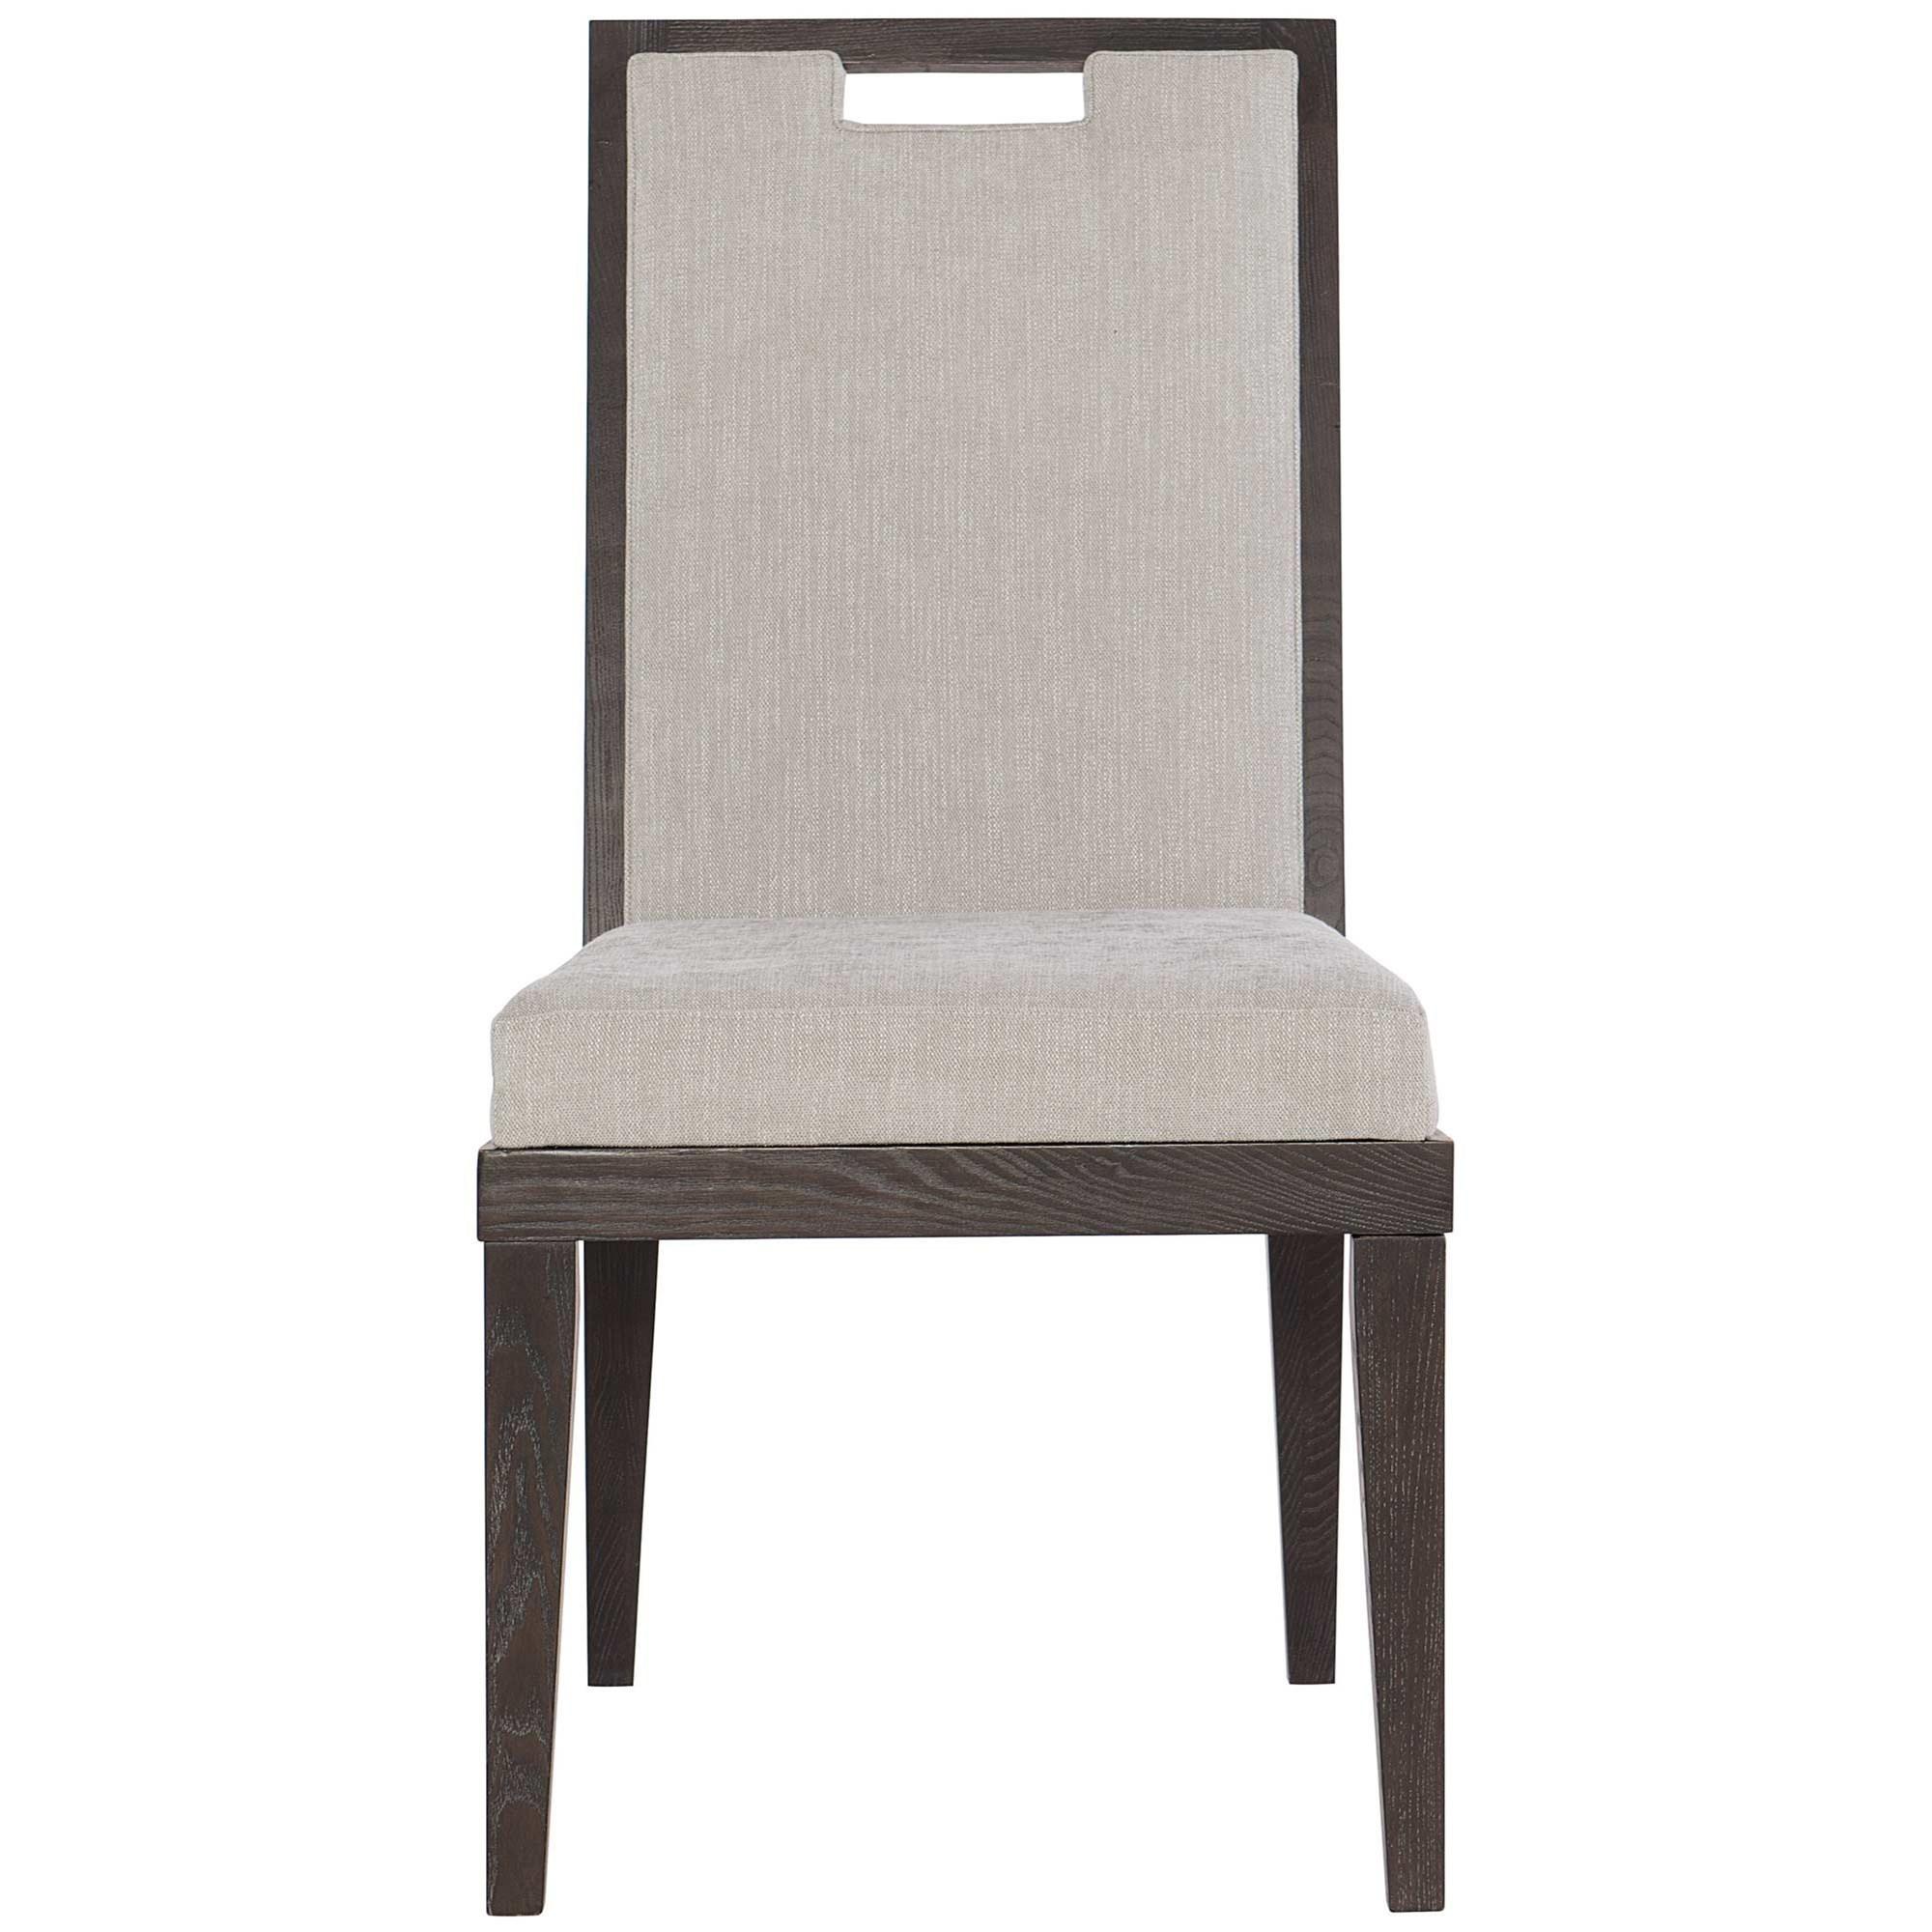 Decorage Side Chair by Bernhardt at Baer's Furniture